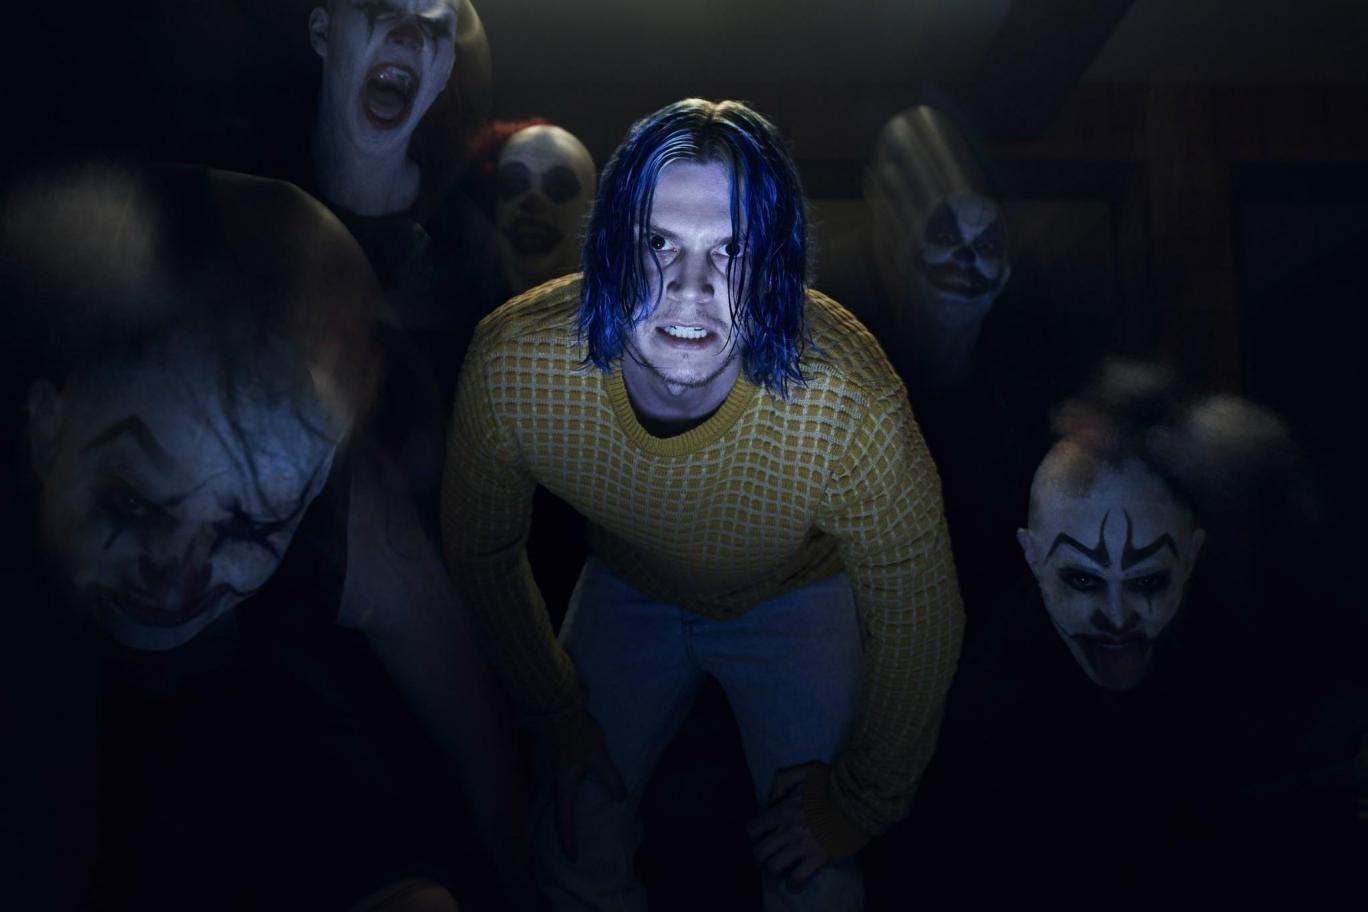 American horror story greek online dating